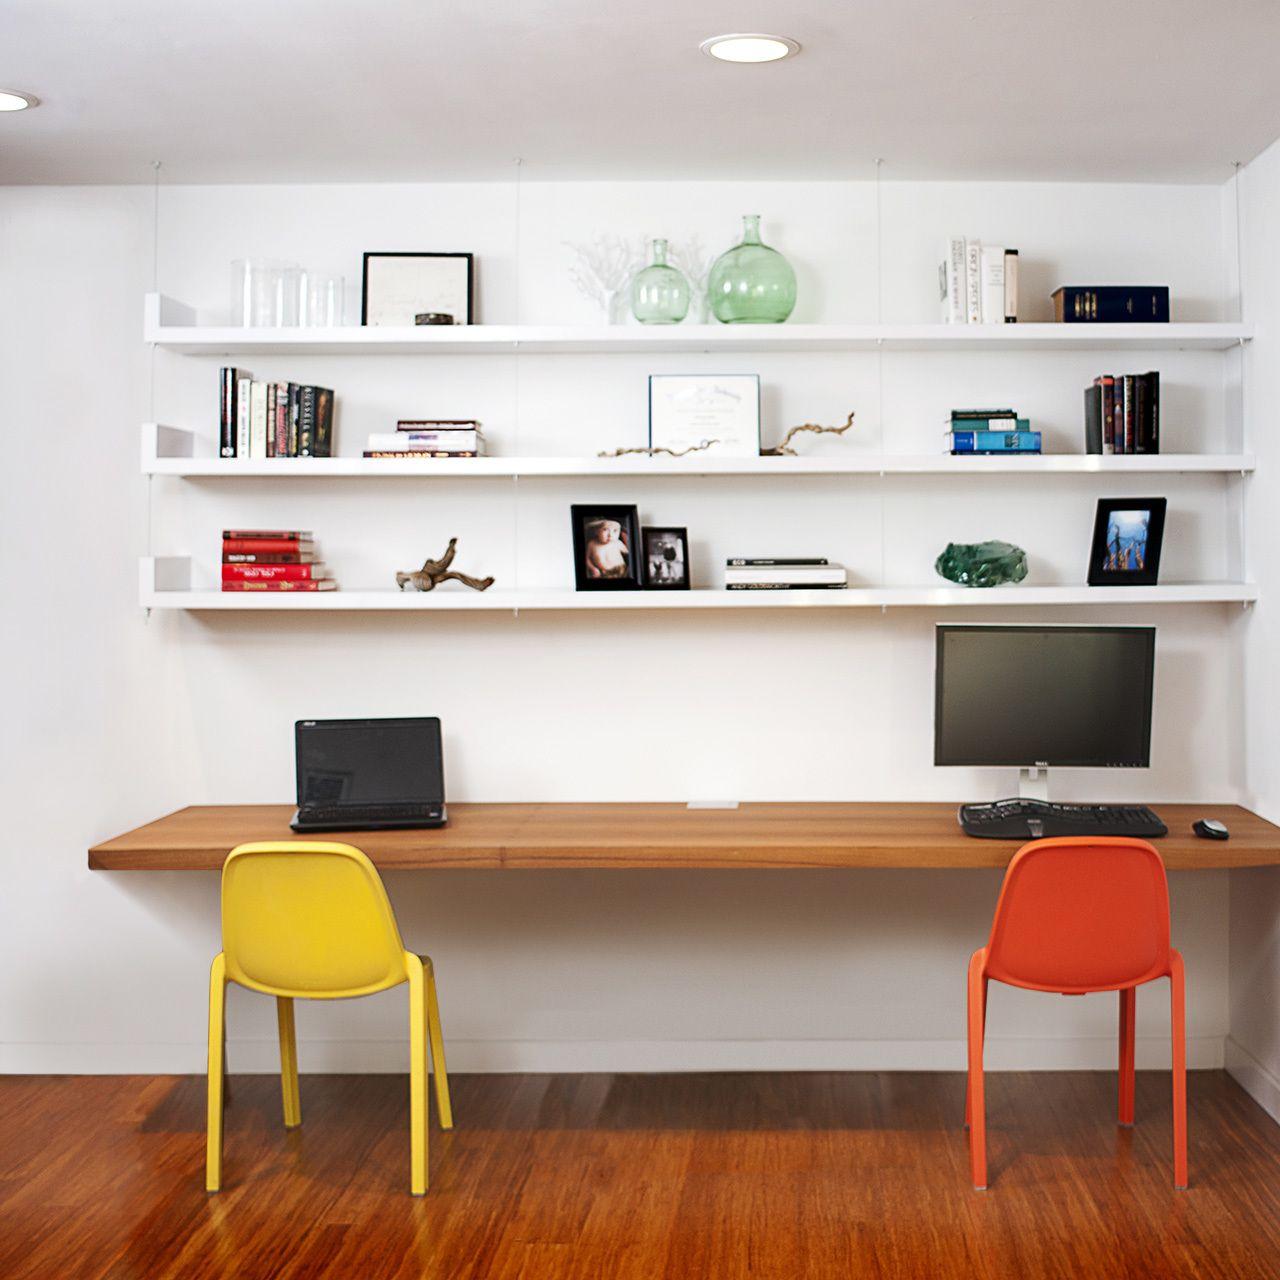 Yuri Hd Desk Bracket Square Rod Home Office Decor Home Office